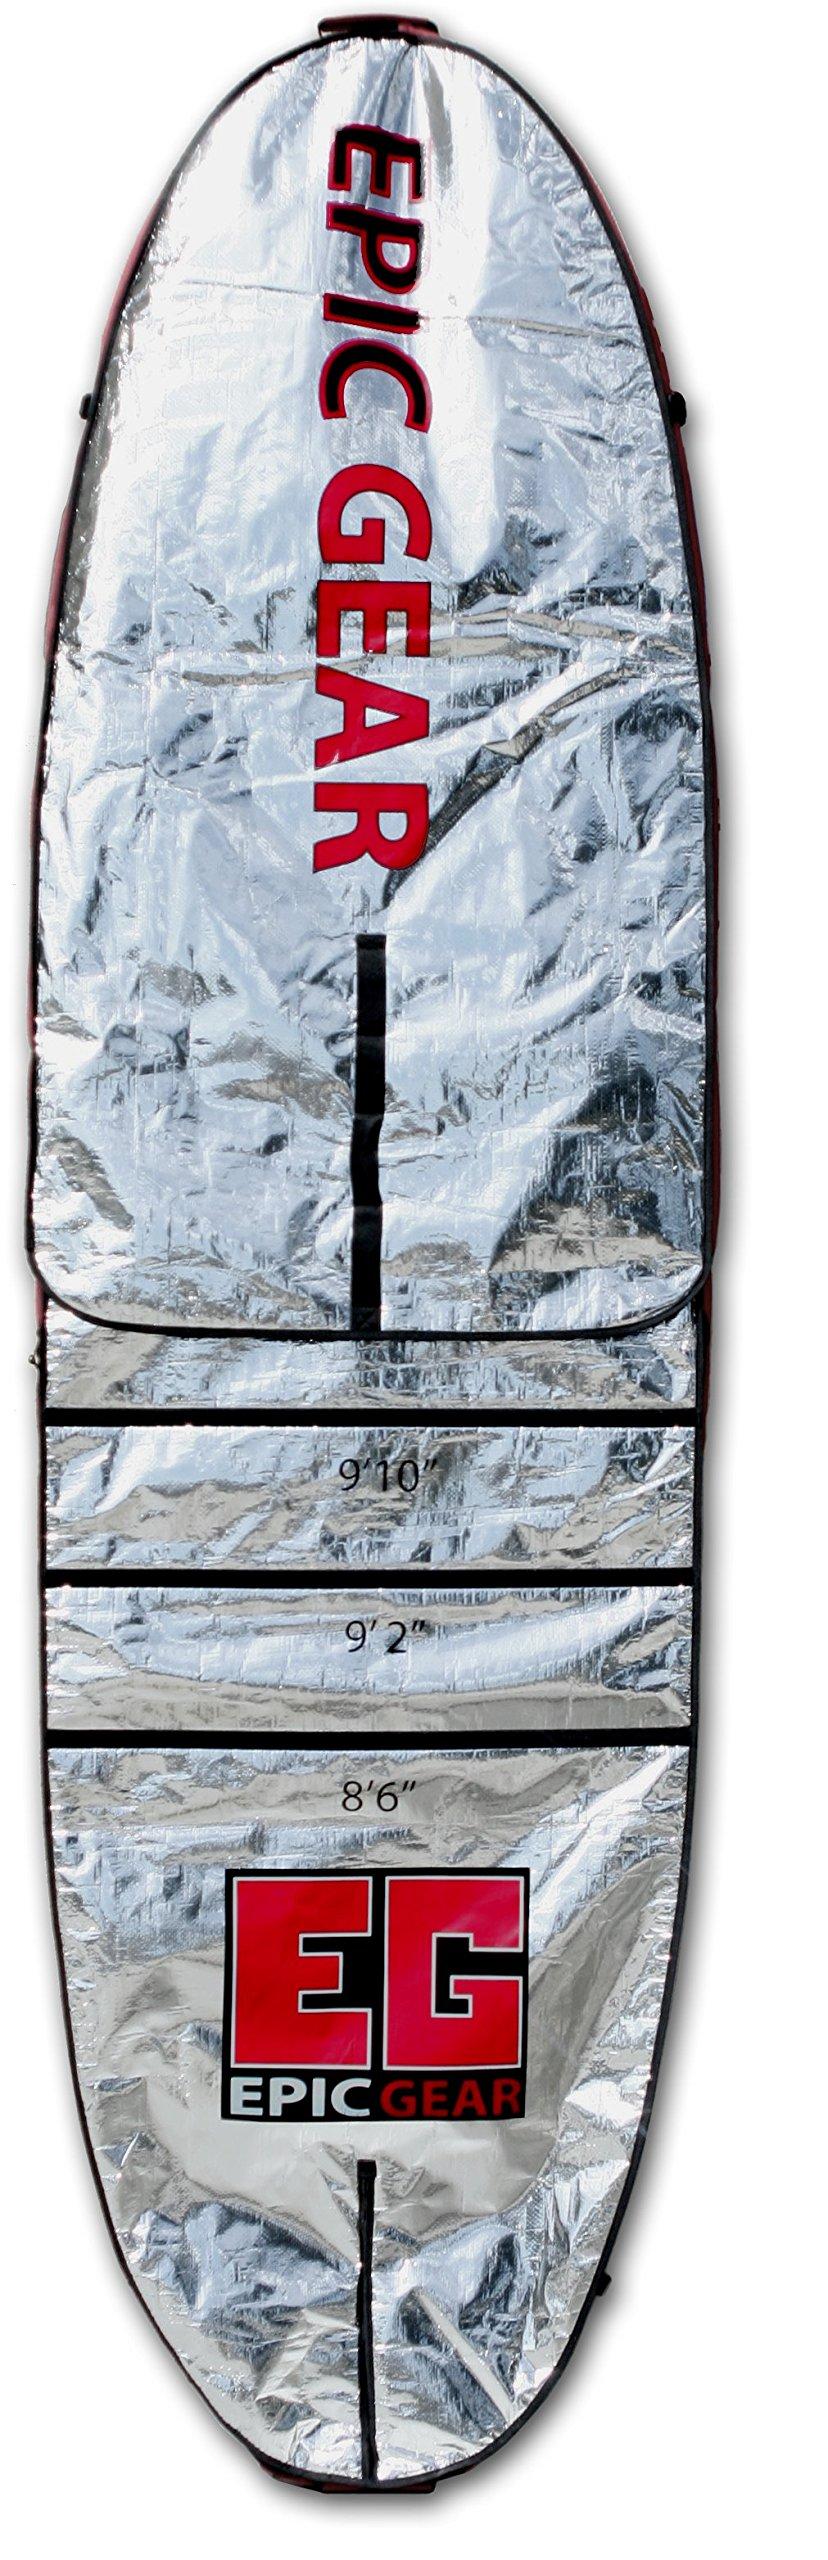 Epic Gear Adjustable Economy Day Wall 10'6'' - 12'6'' x 32'' SUP Bag, SUP Board Bag, Board Bag